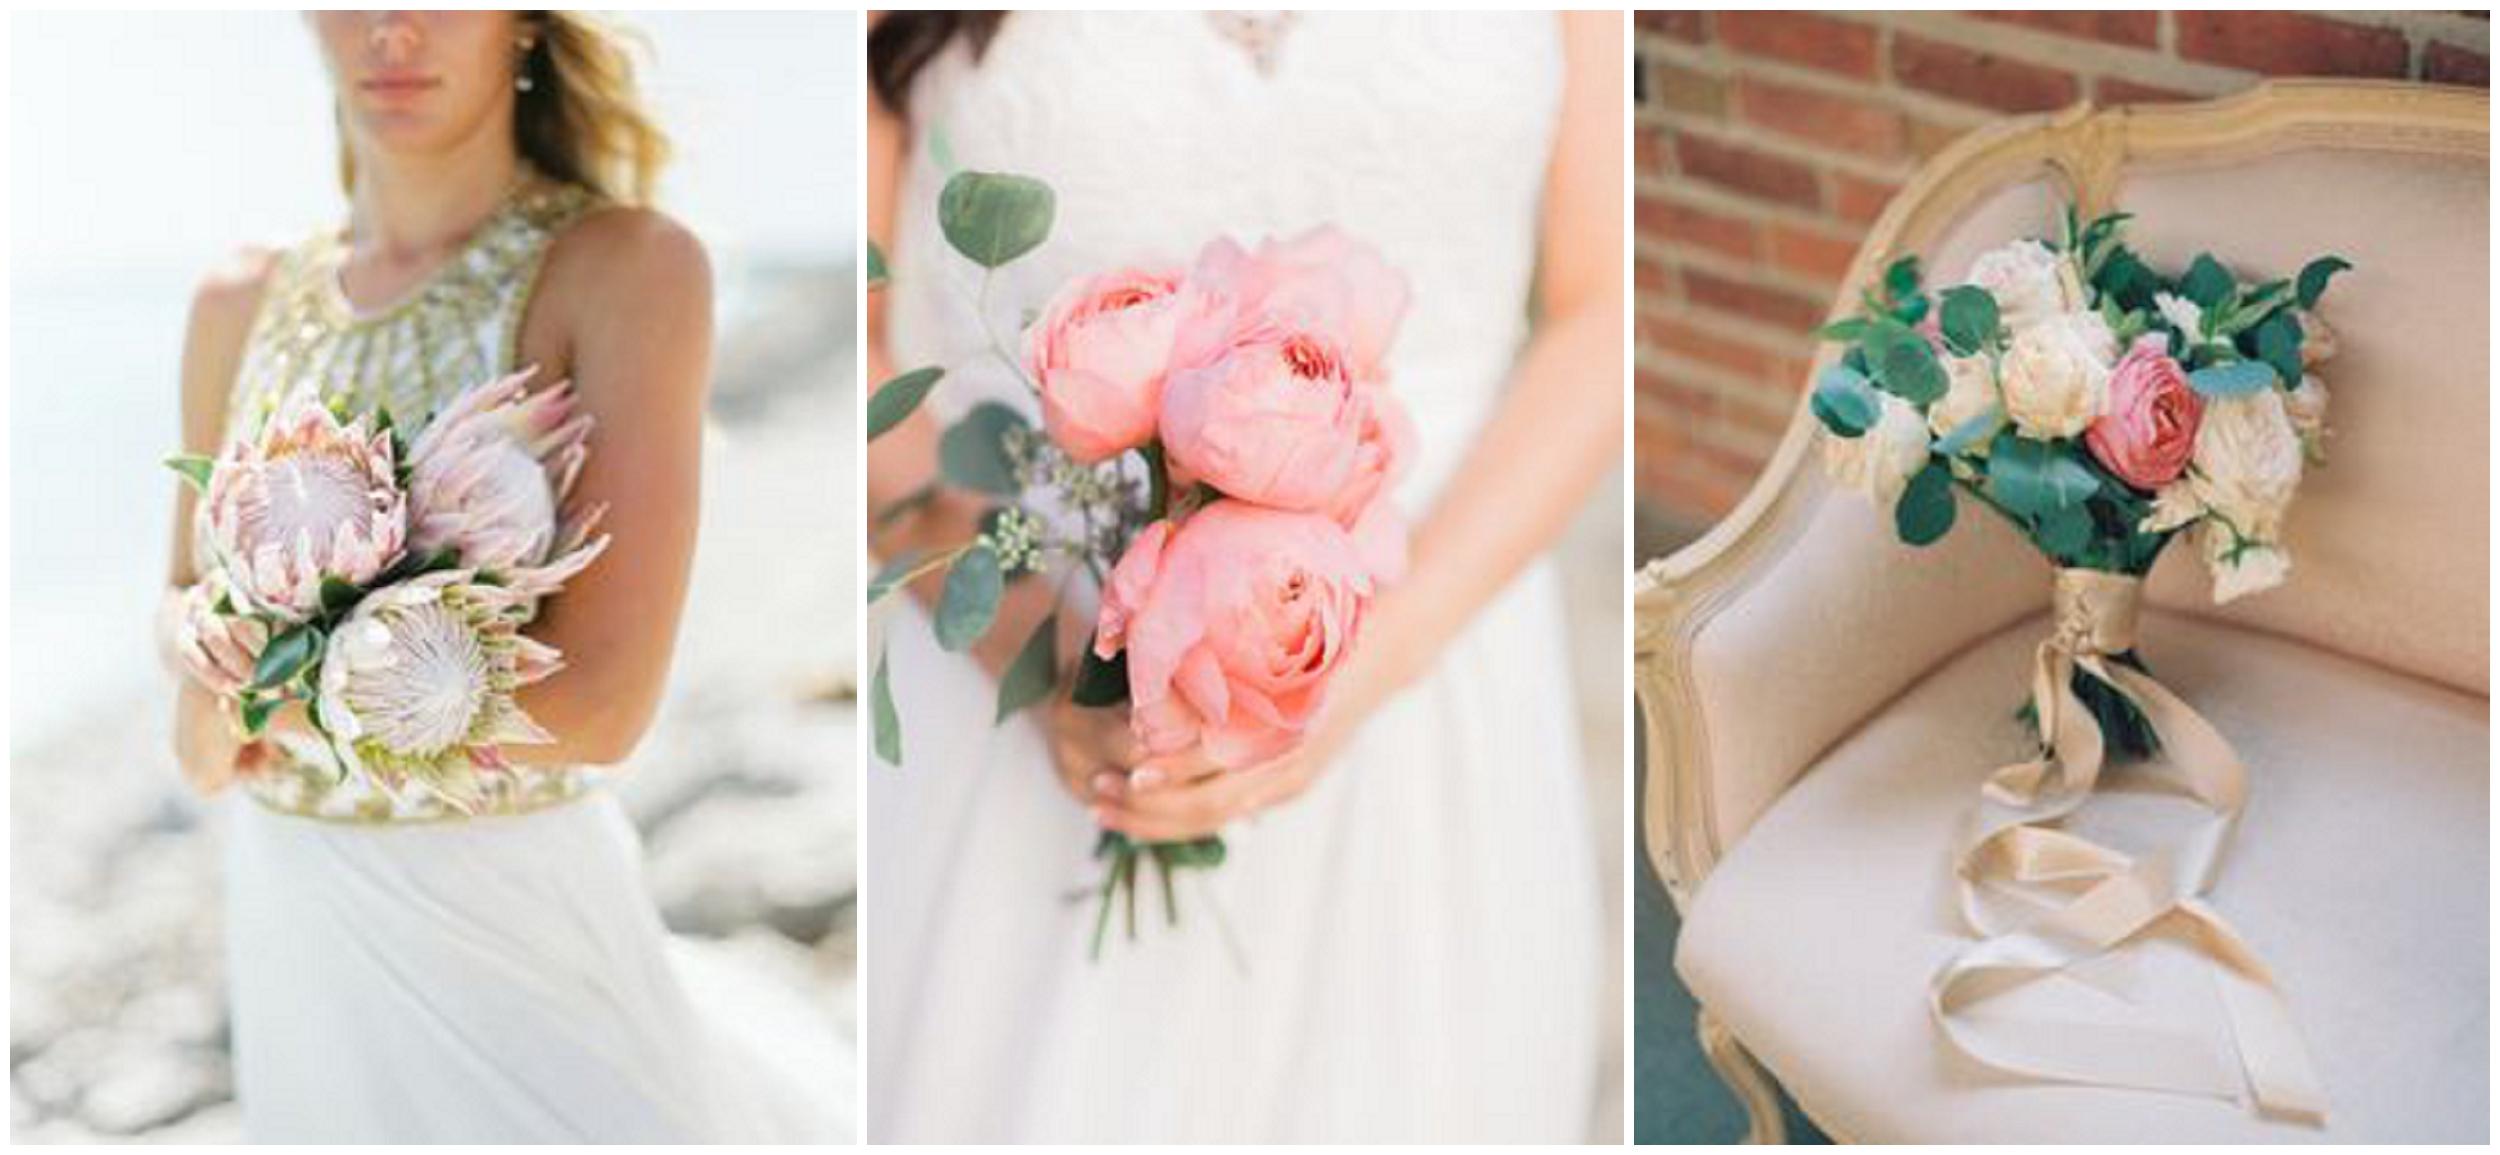 maria+rao+wedding+photographer+portugal_0166.jpg